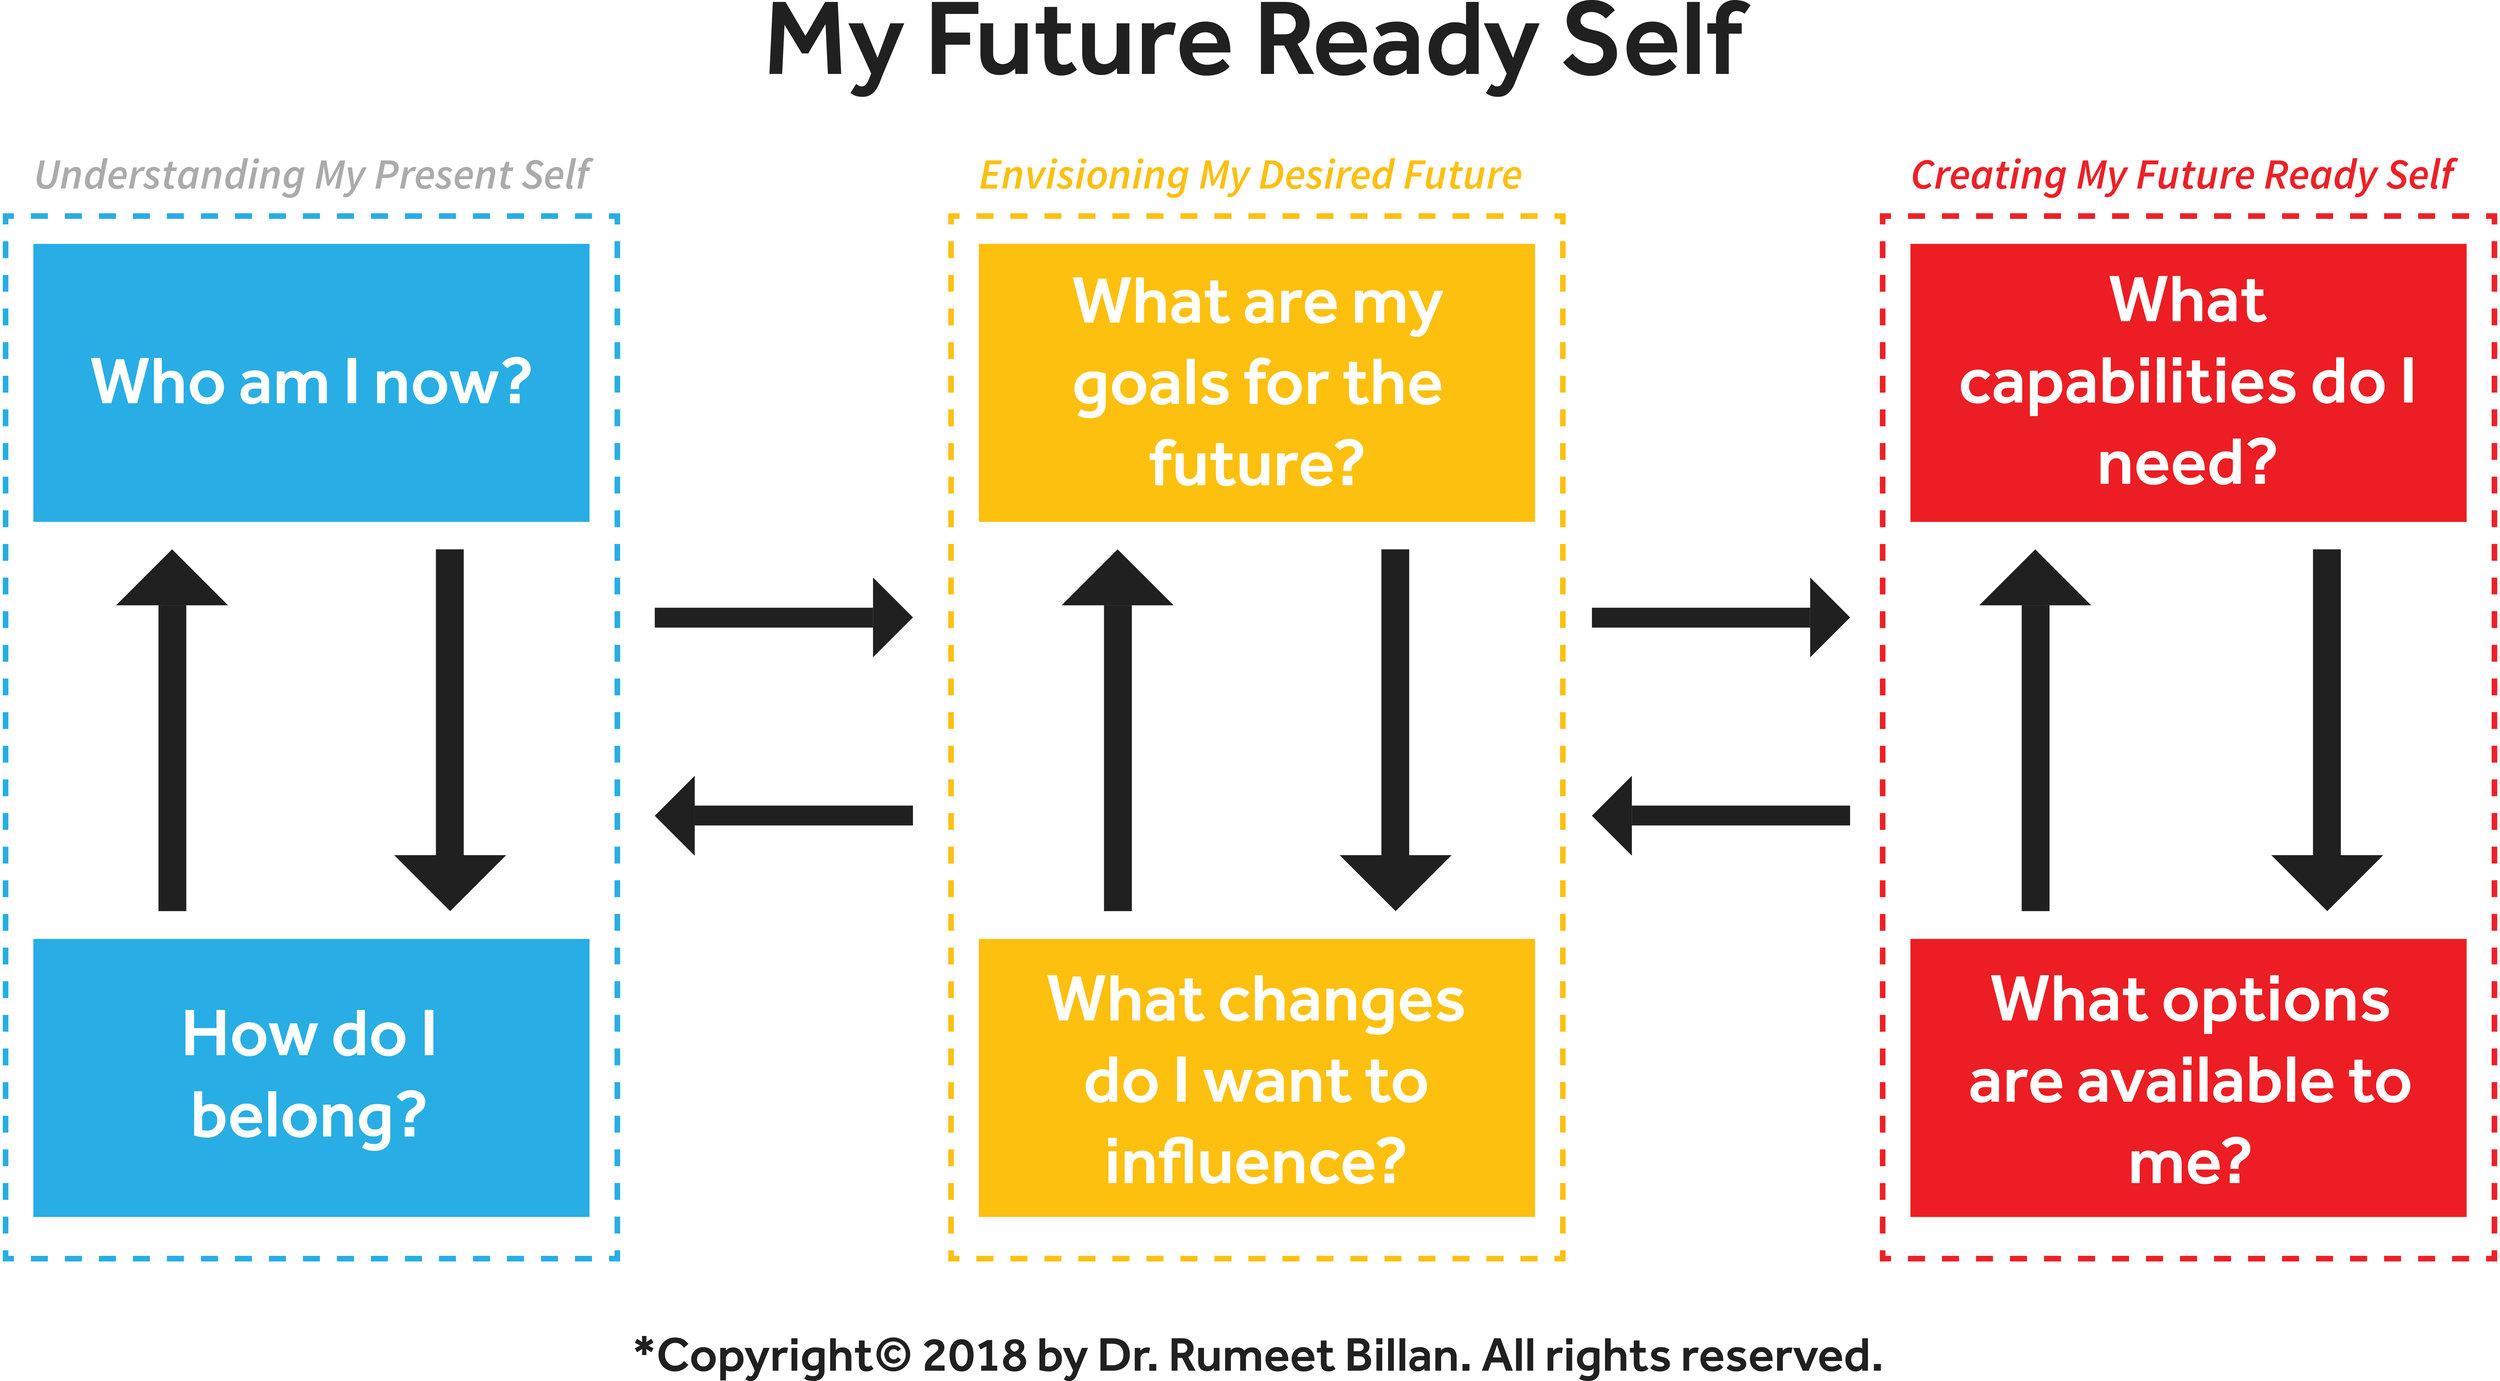 model-my-future-ready-self.jpg